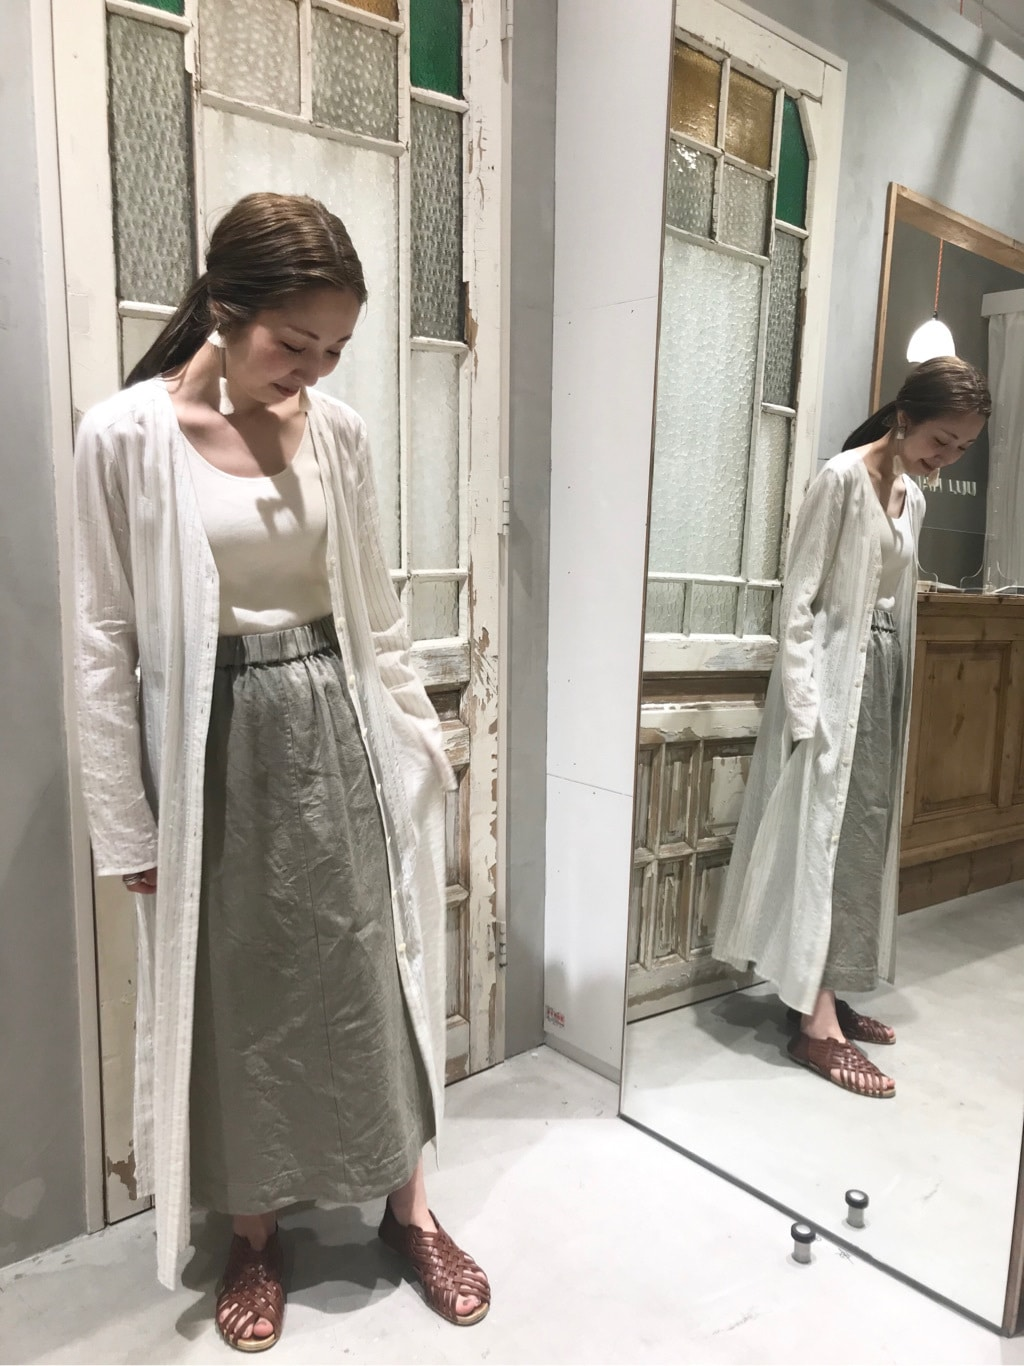 yuni 東急プラザ銀座 身長:155cm 2020.06.15